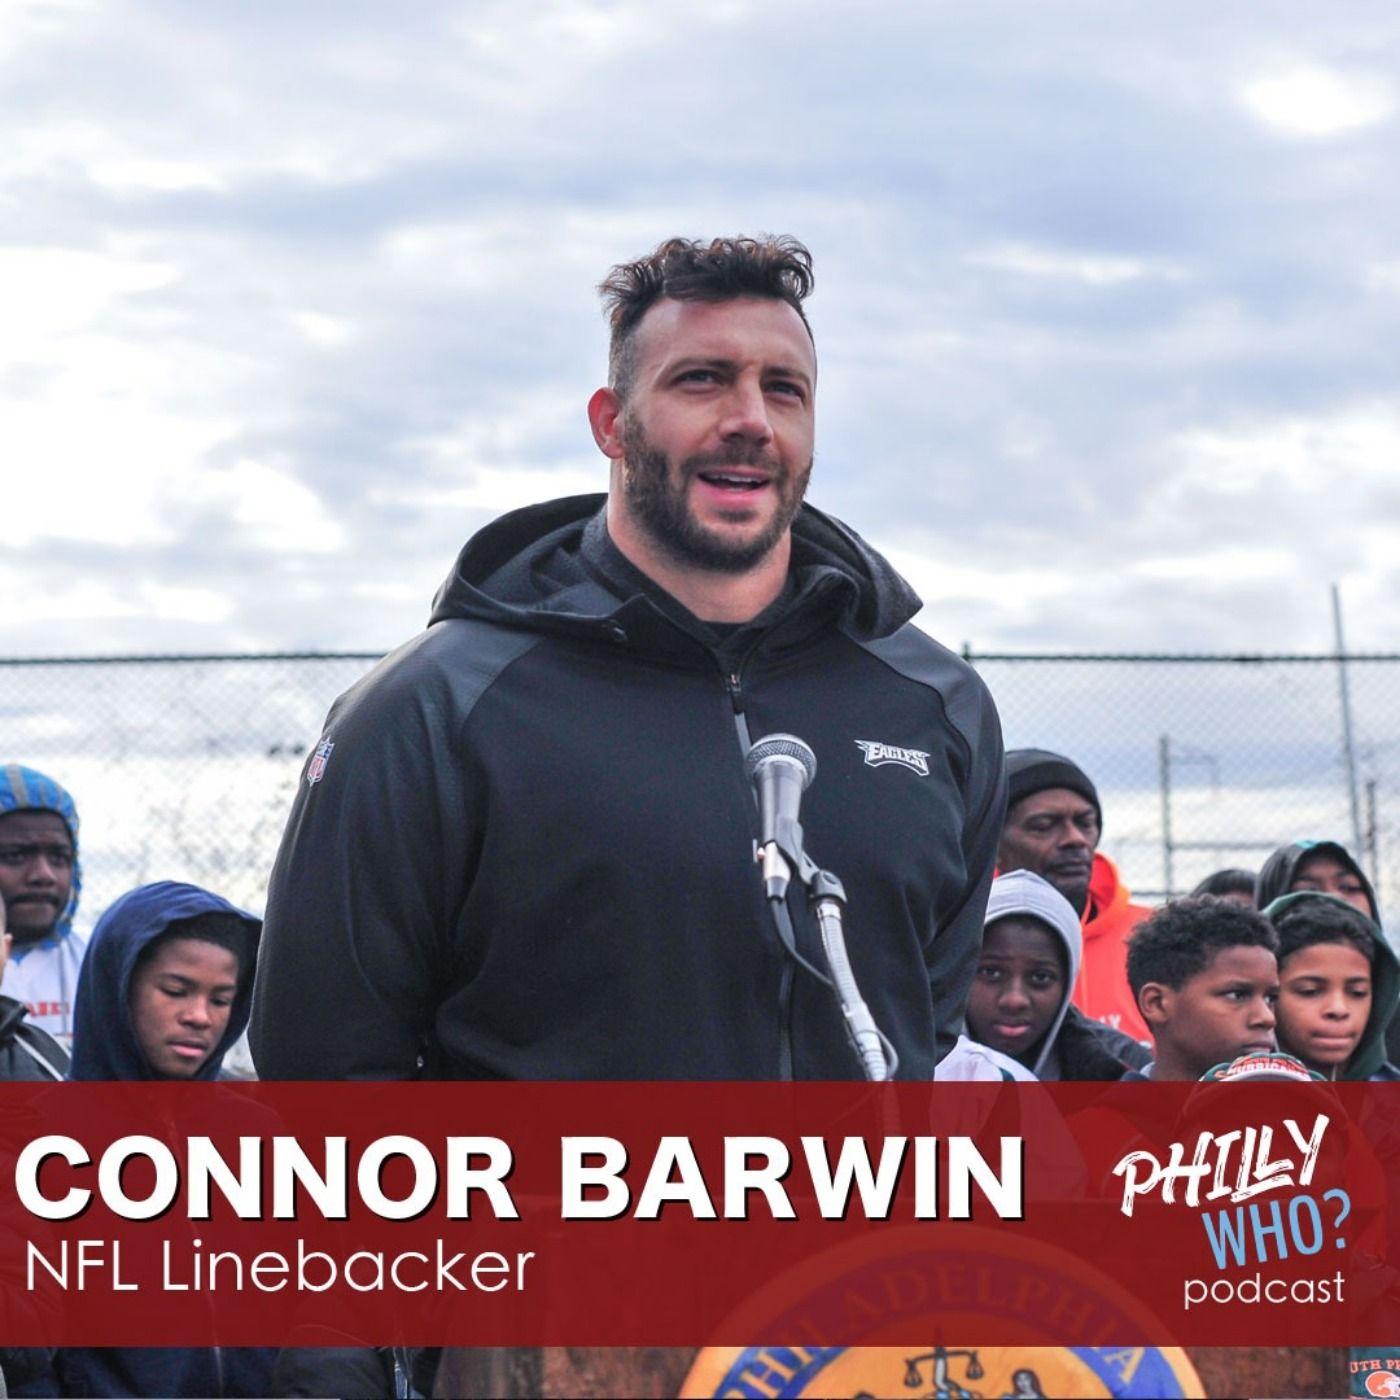 Connor Barwin: The NFL Linebacker Rejuvenating Philly Public Parks